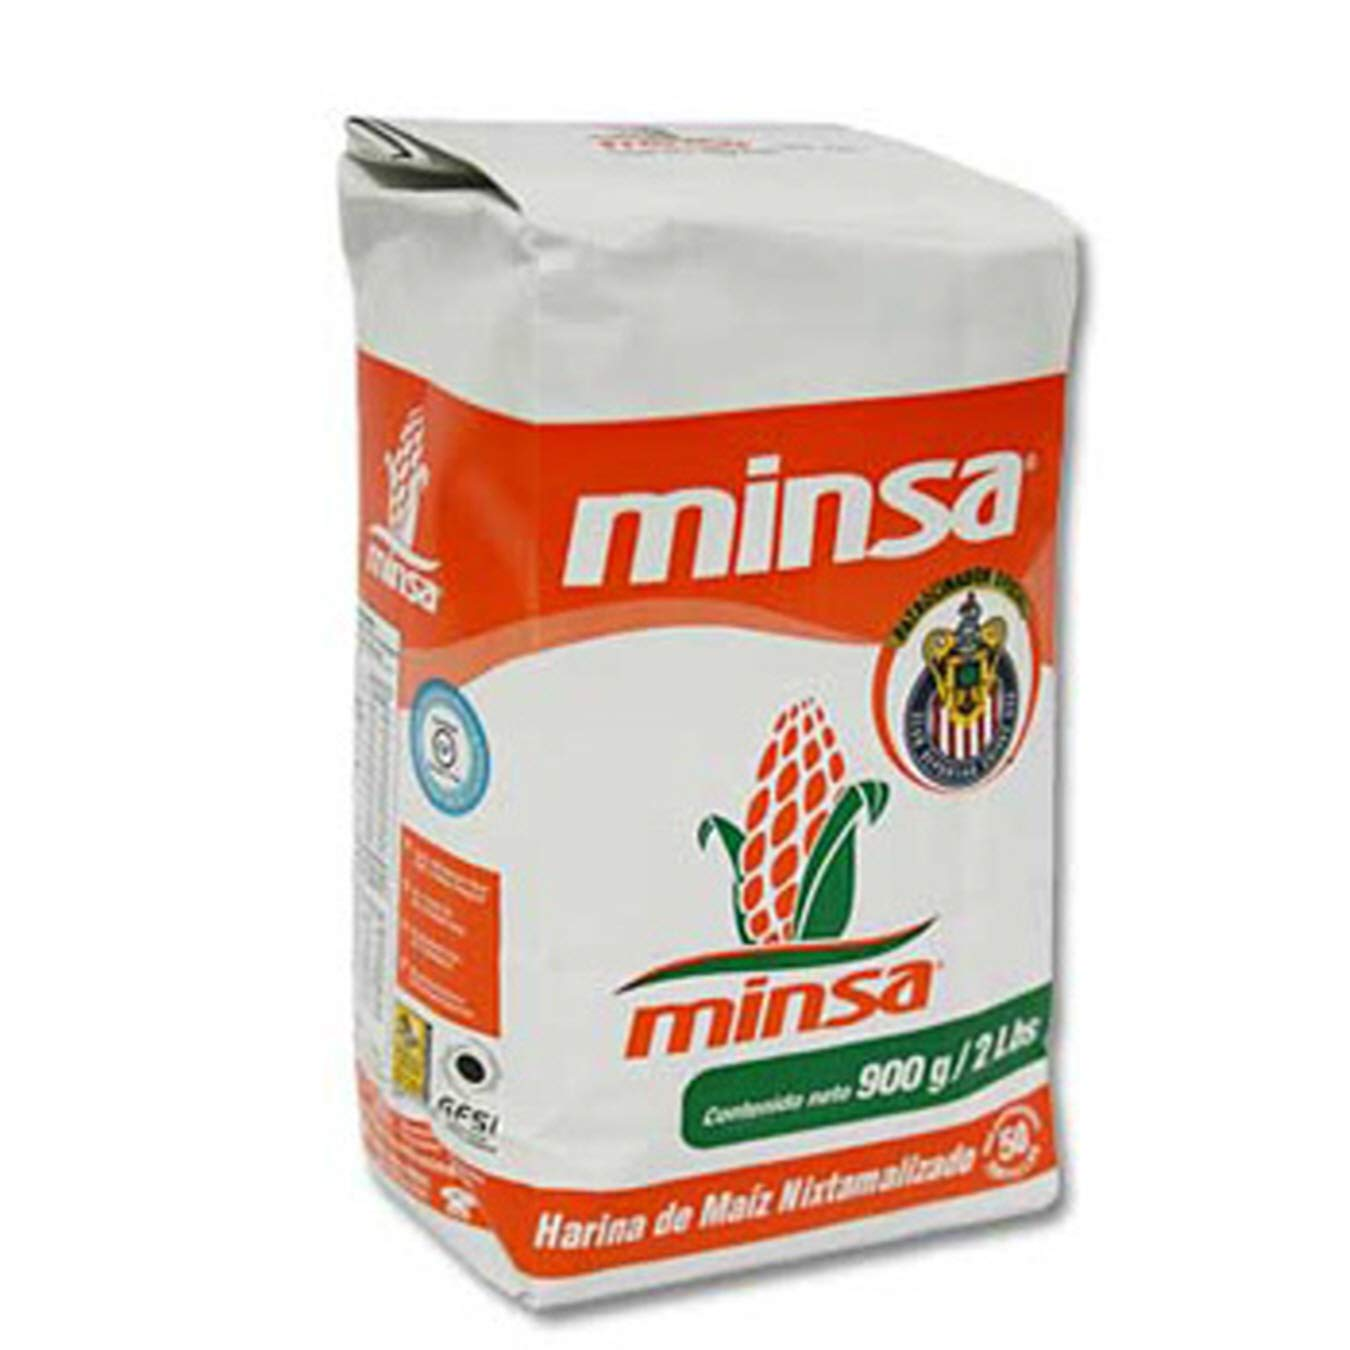 (Pack of 10) Minsa Corn Masa Corn Flour, 1.8lbs